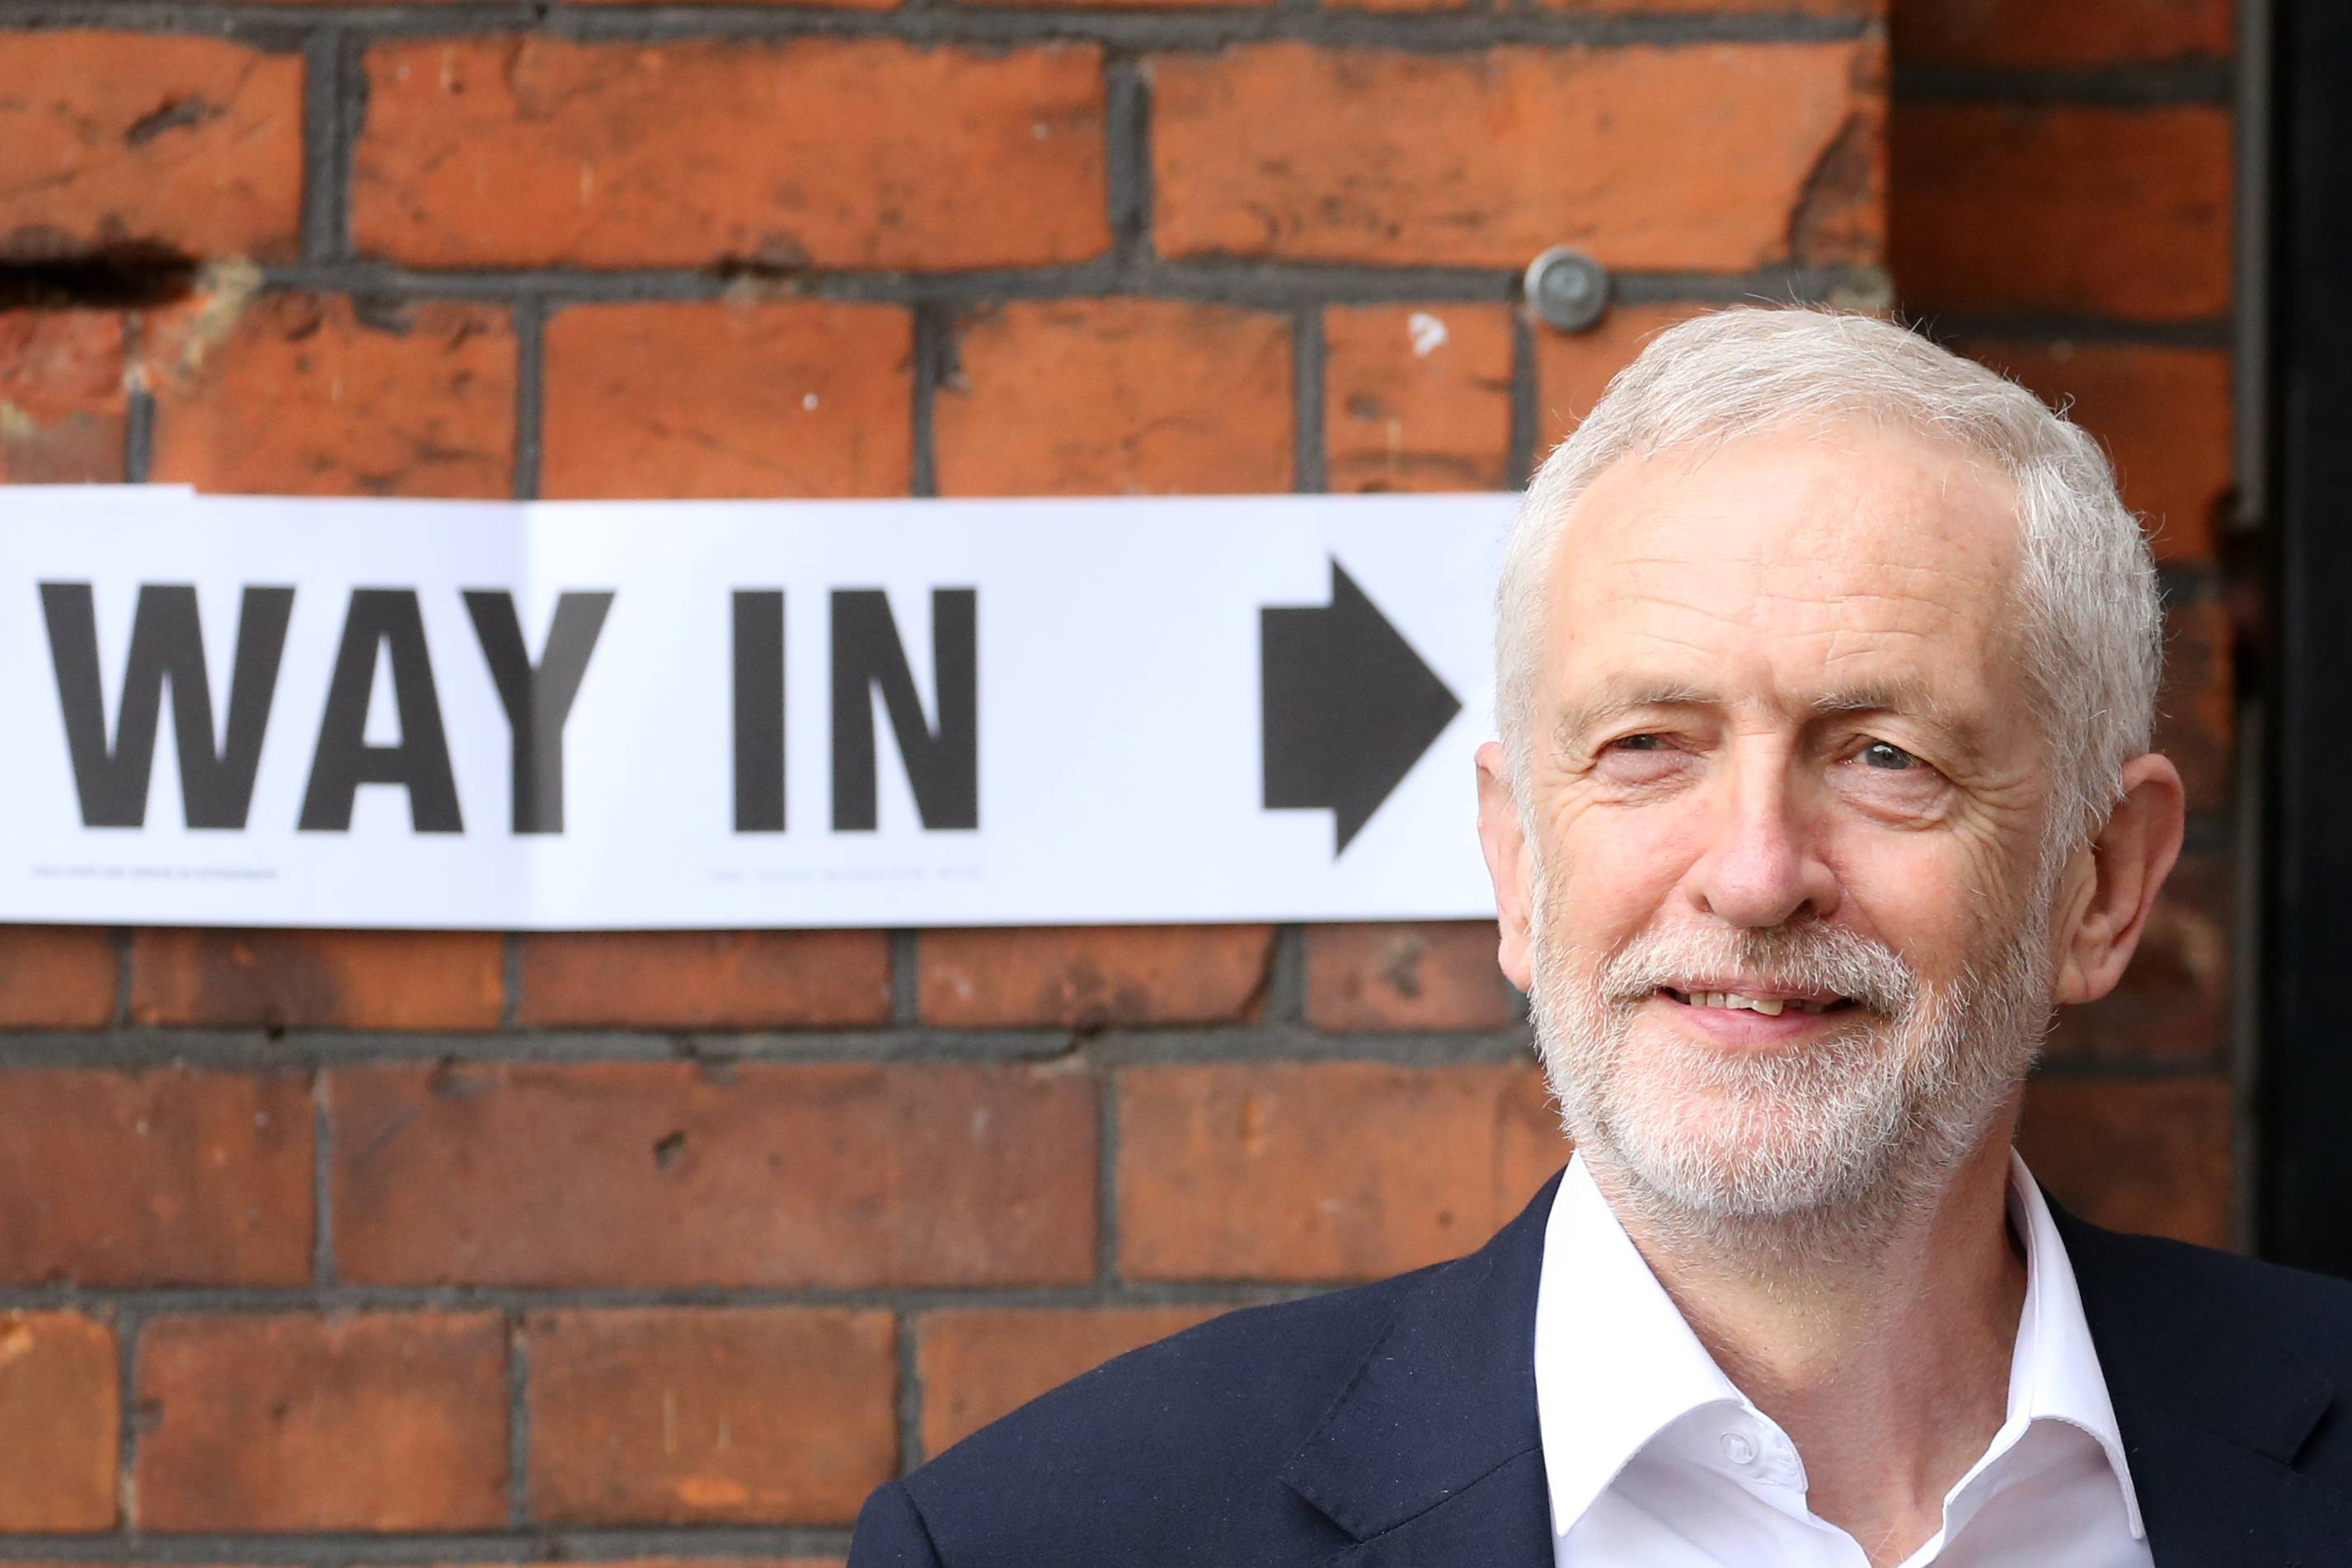 Líder do Partido Trabalhista, da oposição, Jeremy Corbyn | FOTO: Isabel Infantes/AFP